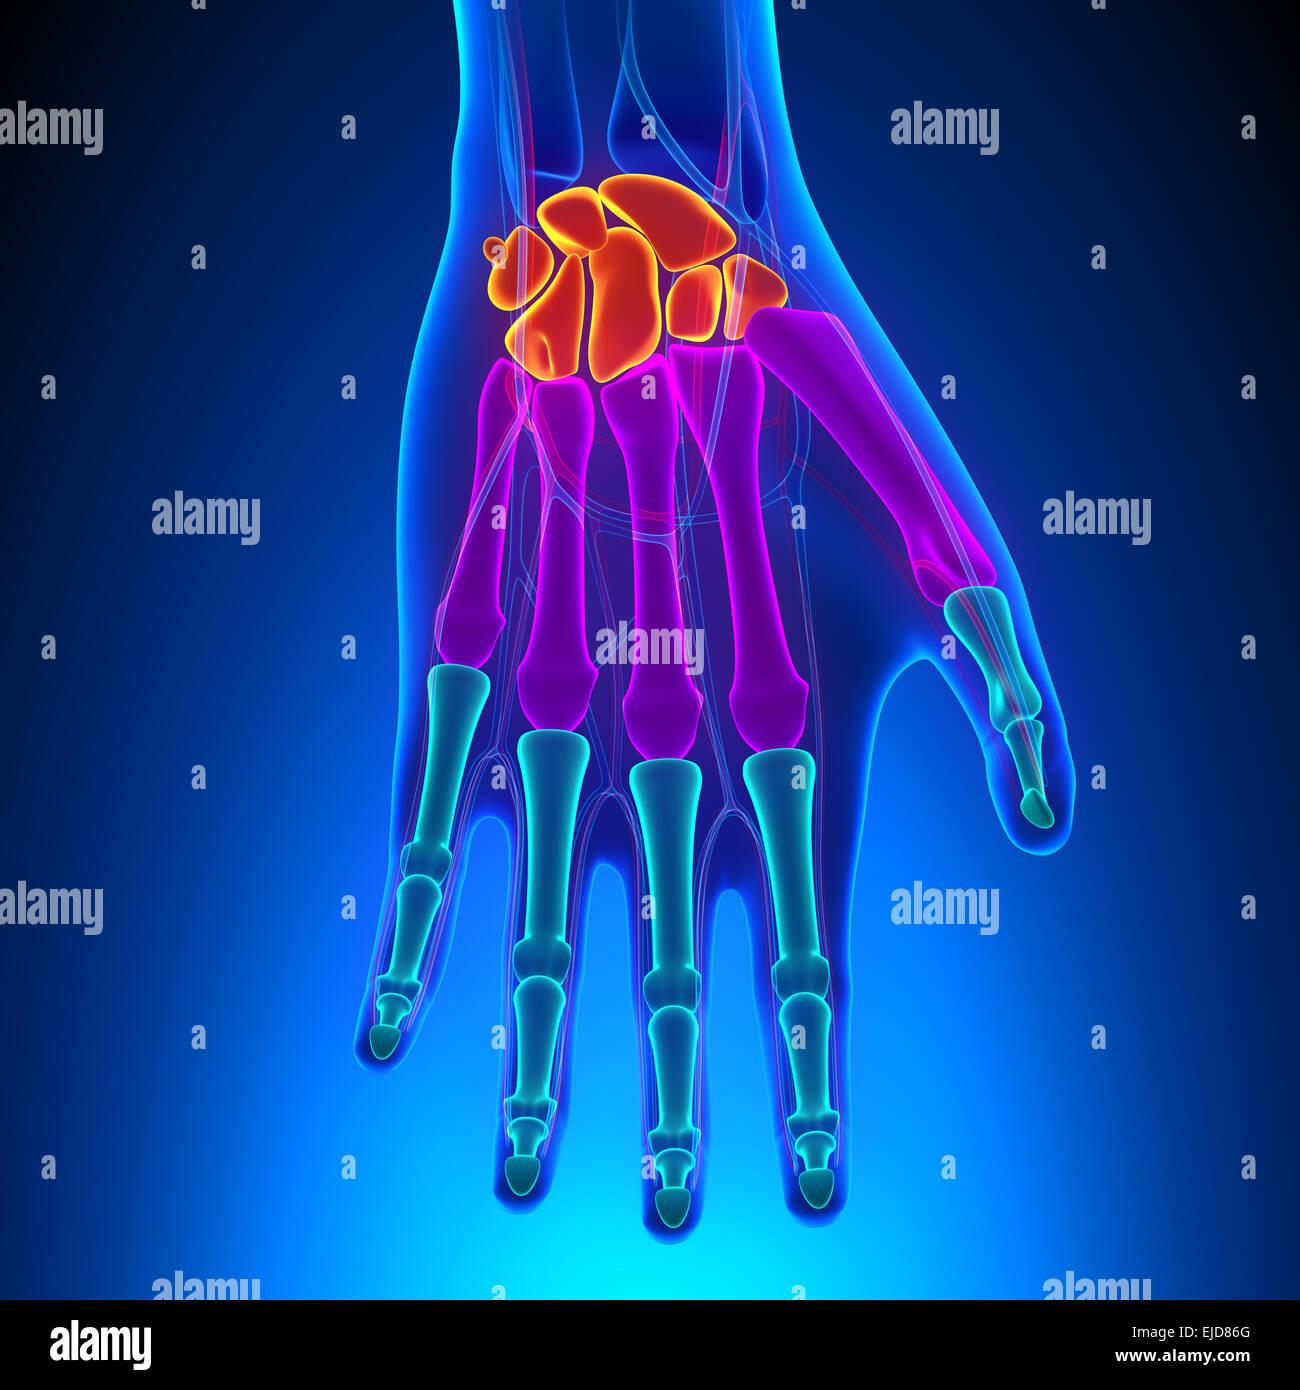 Anatomy Of Human Hand And Wrist With Circulatory System Stock Photo